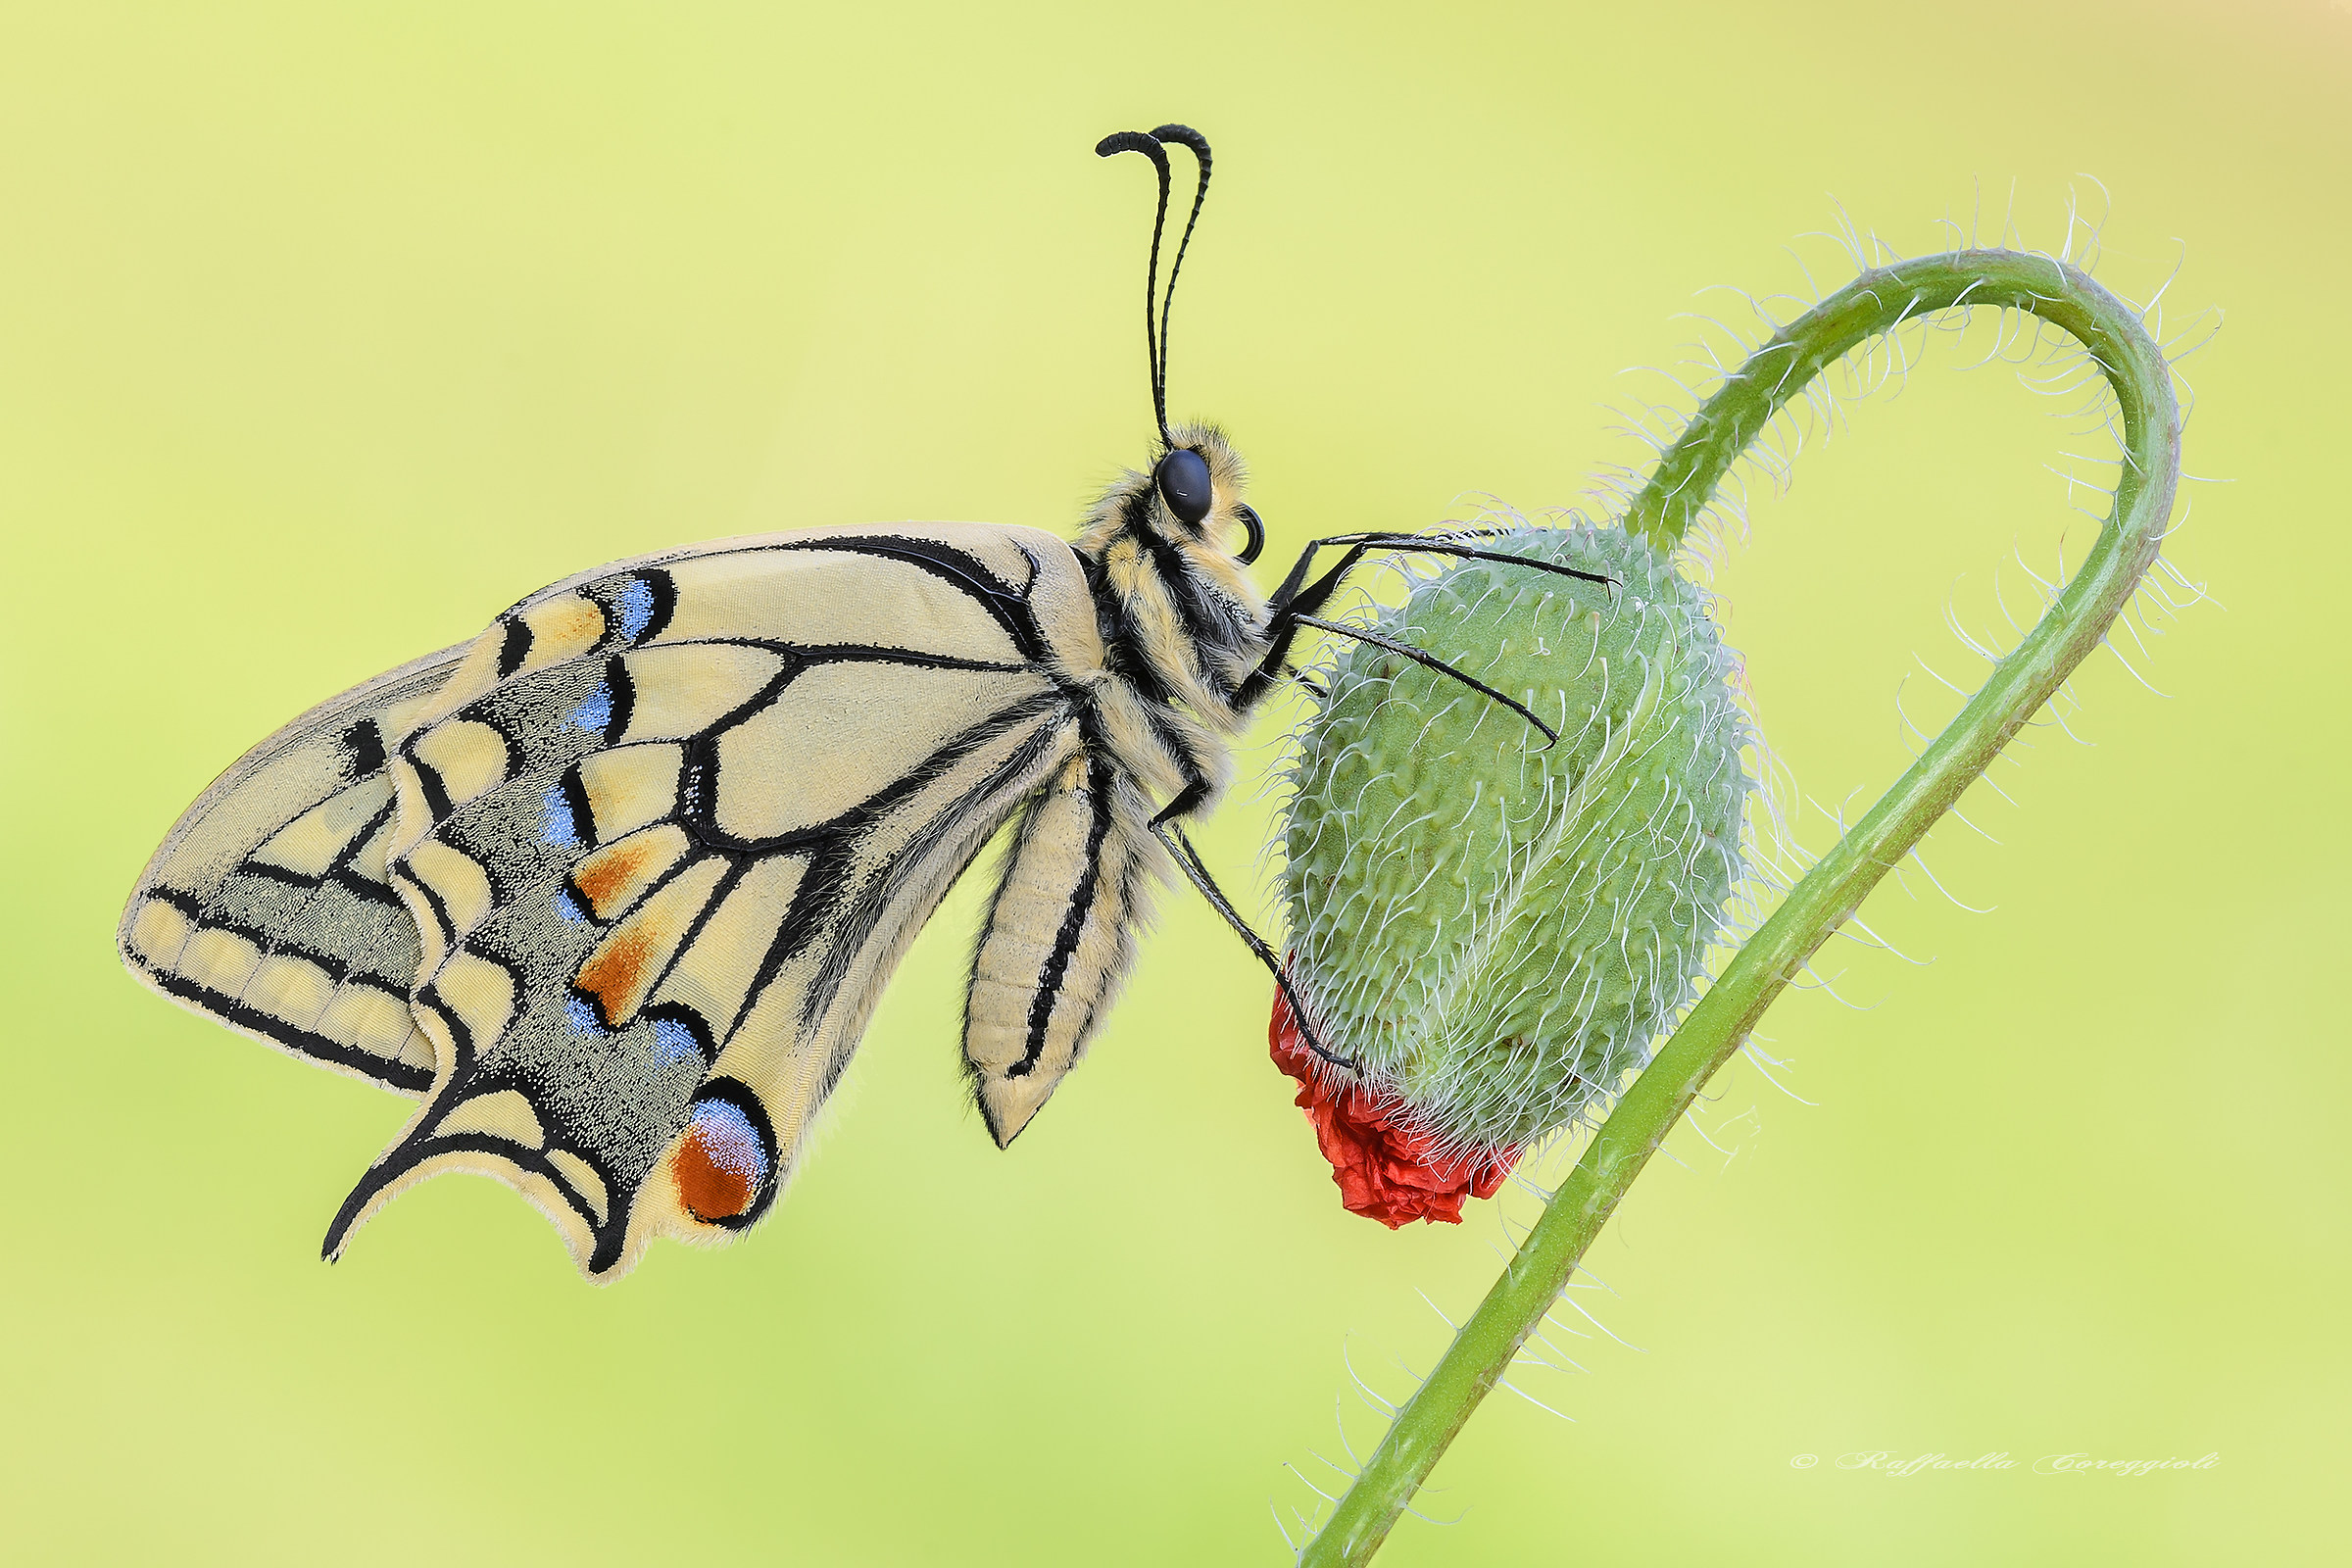 Un Papilio speciale...